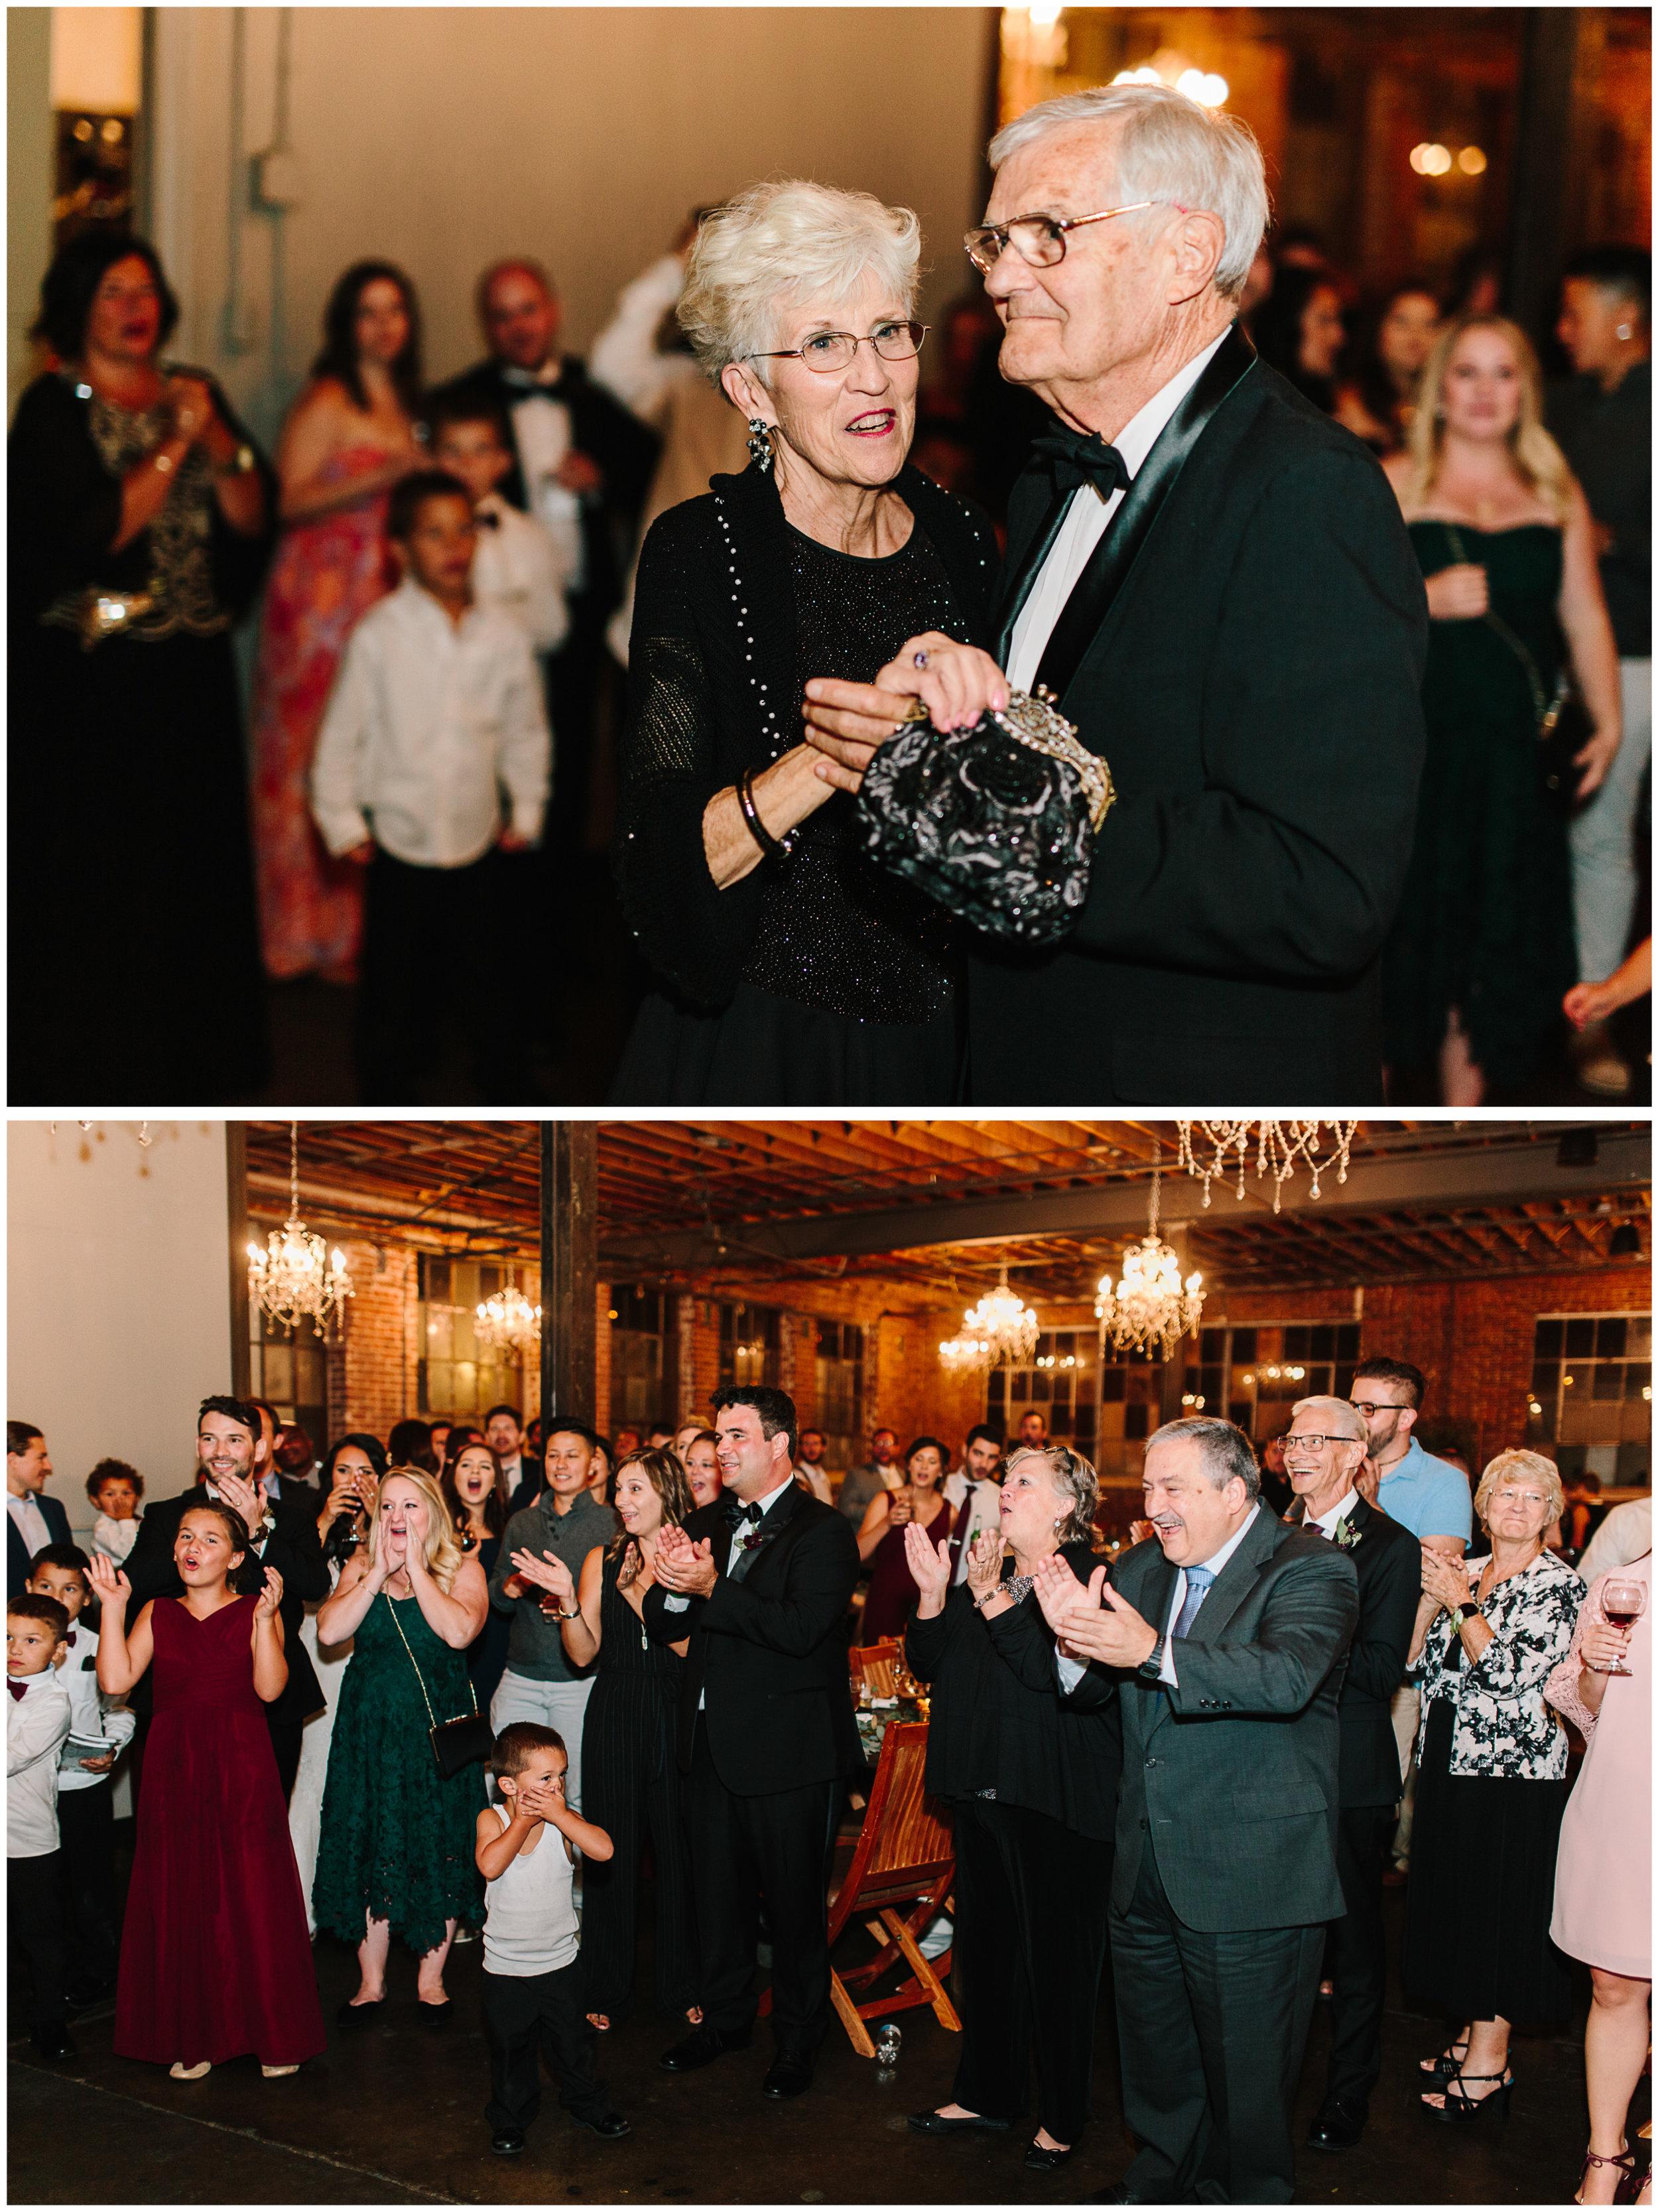 moss_denver_wedding_81.jpg